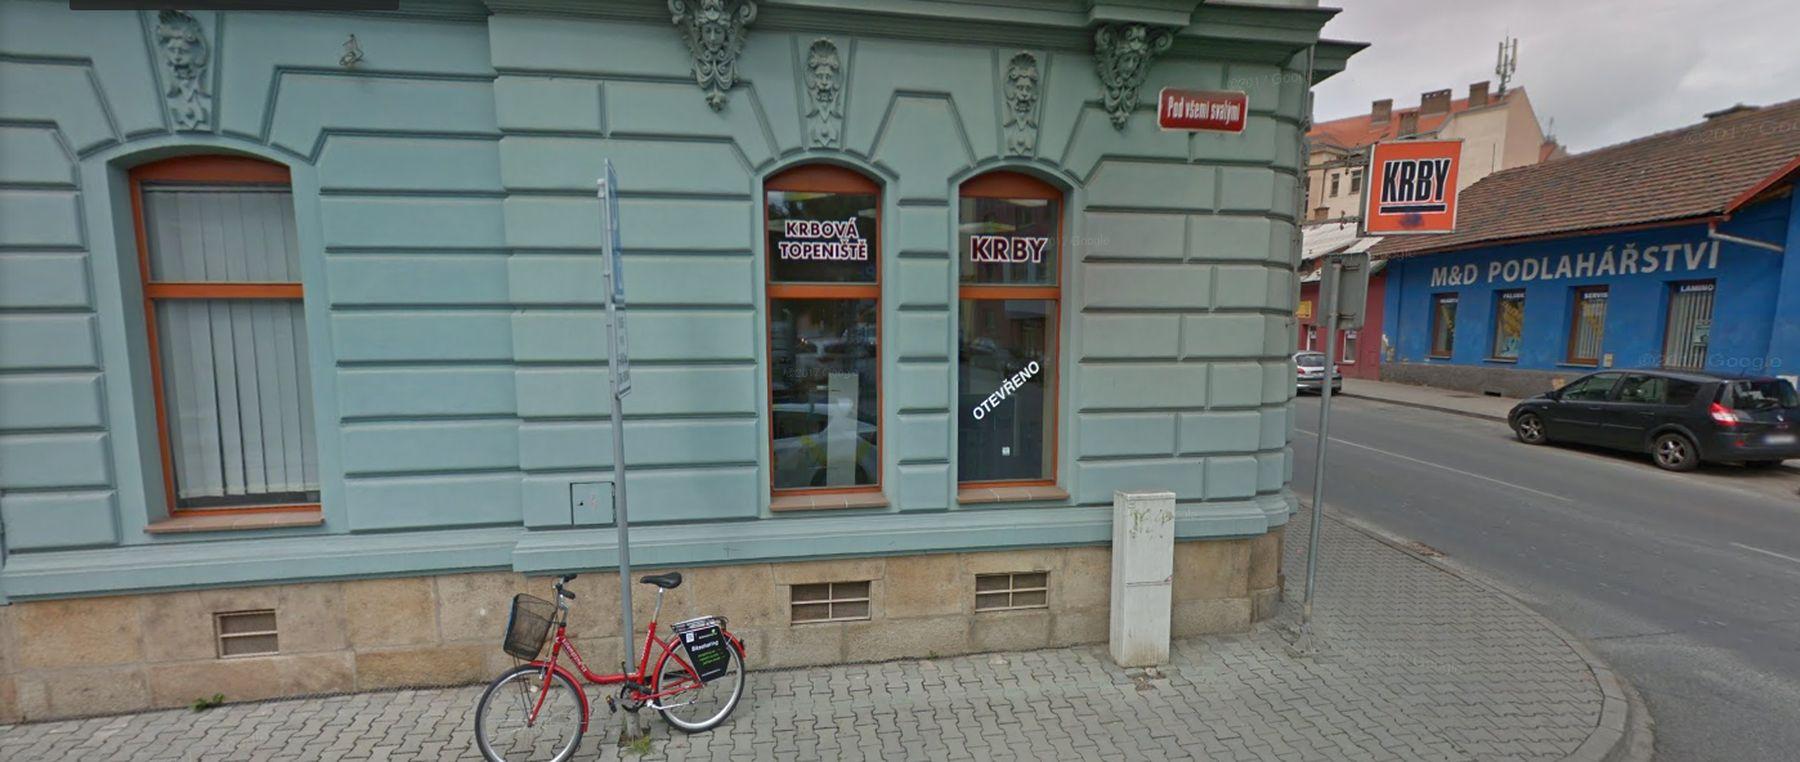 KRBY Plzeň - profesionálové na trhu s krby - prodej krbů v Plzni